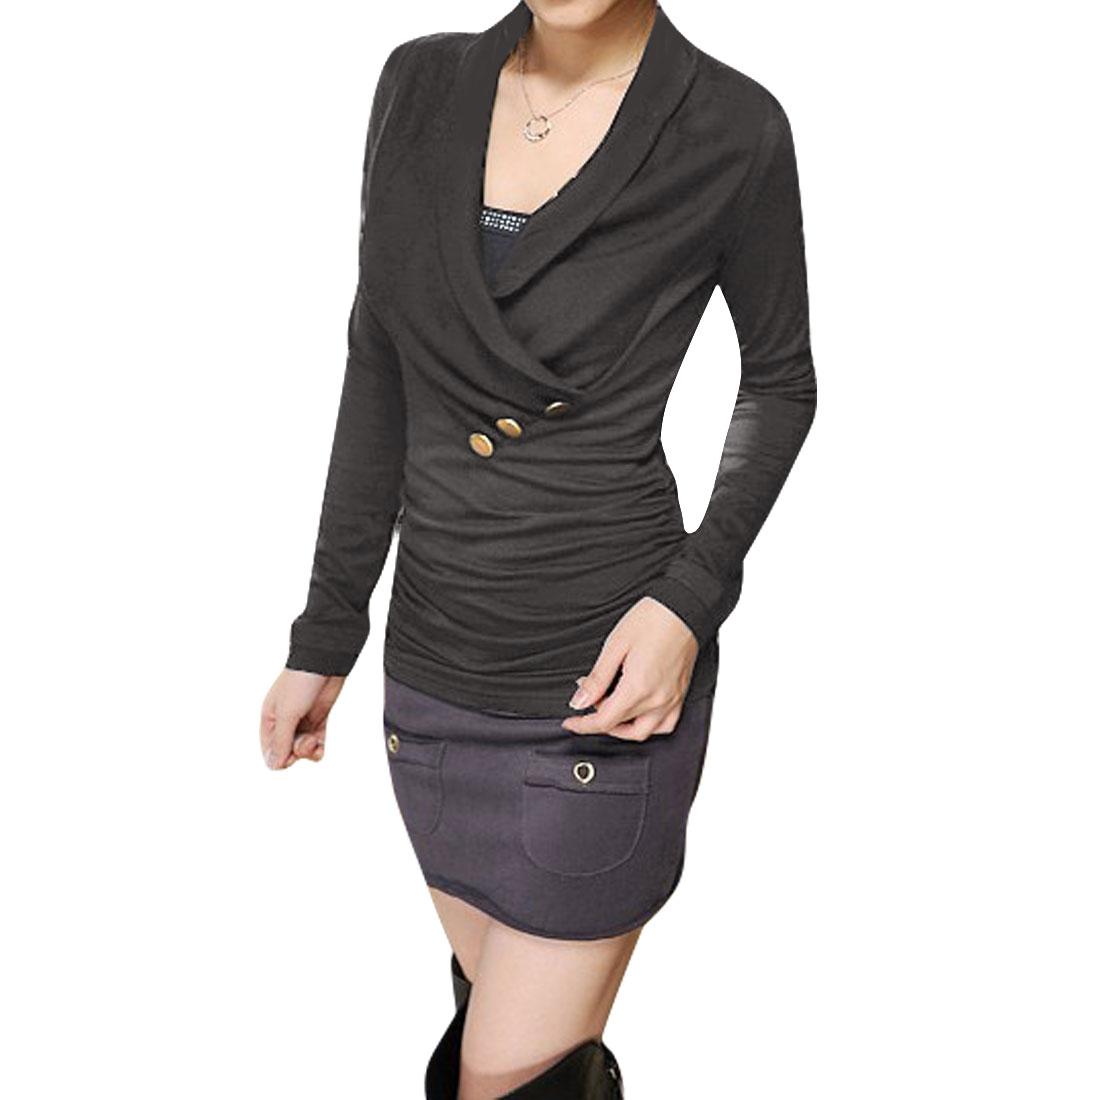 Women Long Sleeves Dark Gray Crossover V Neck Shirt S